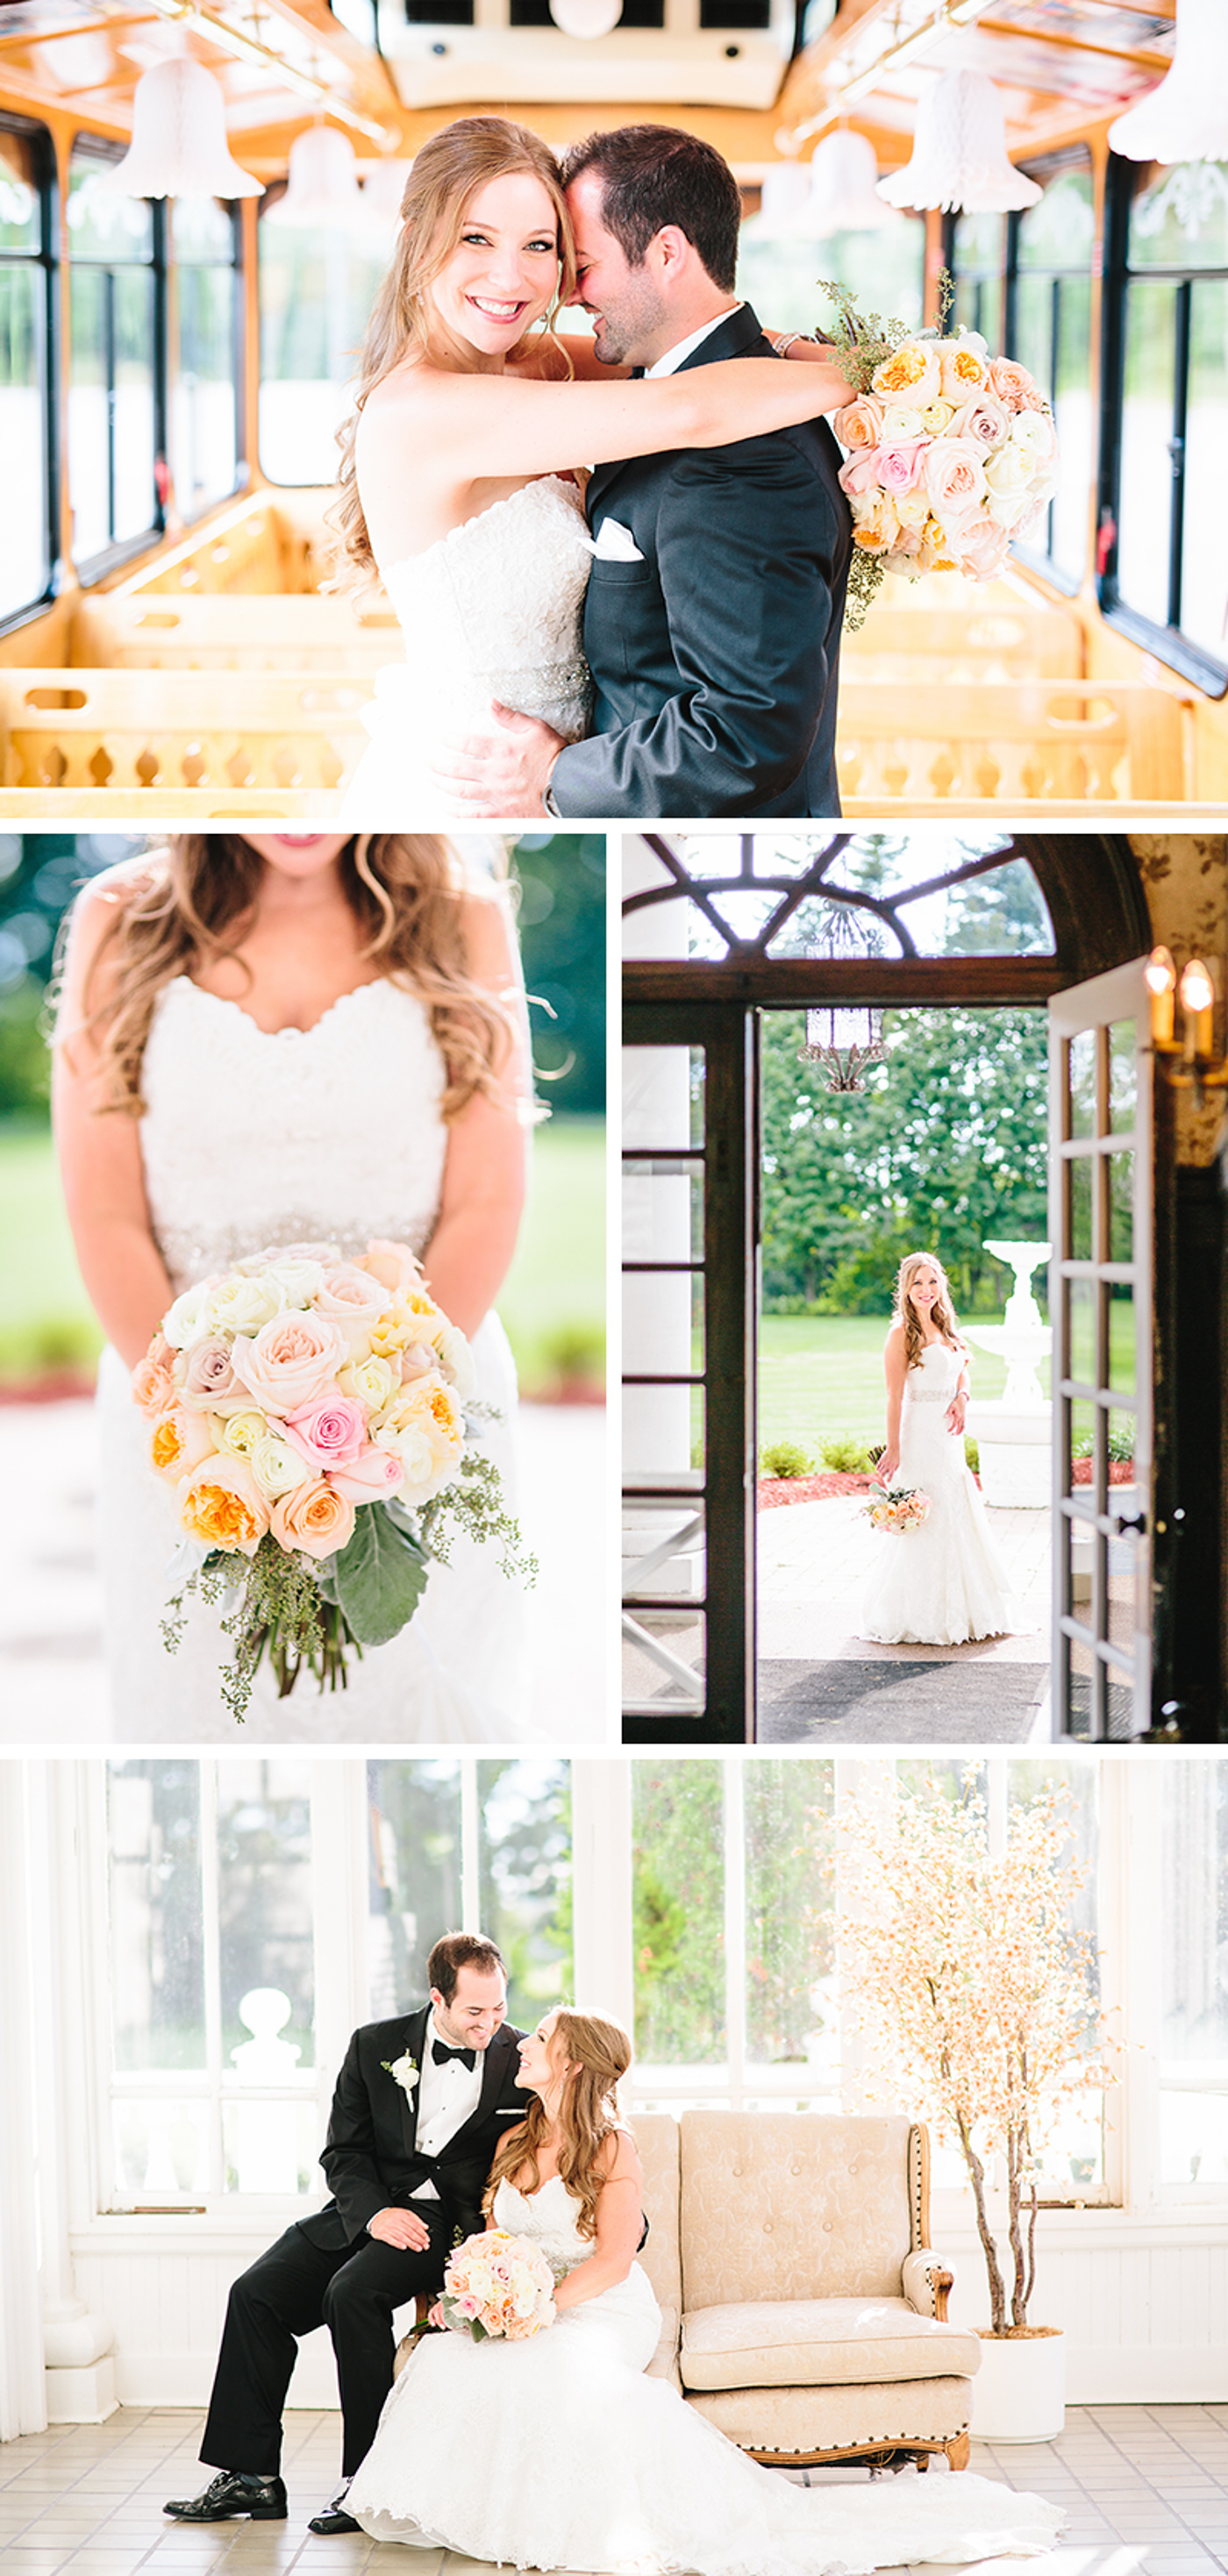 Chicago_Fine_Art_Wedding_Photography_shelley.jpg